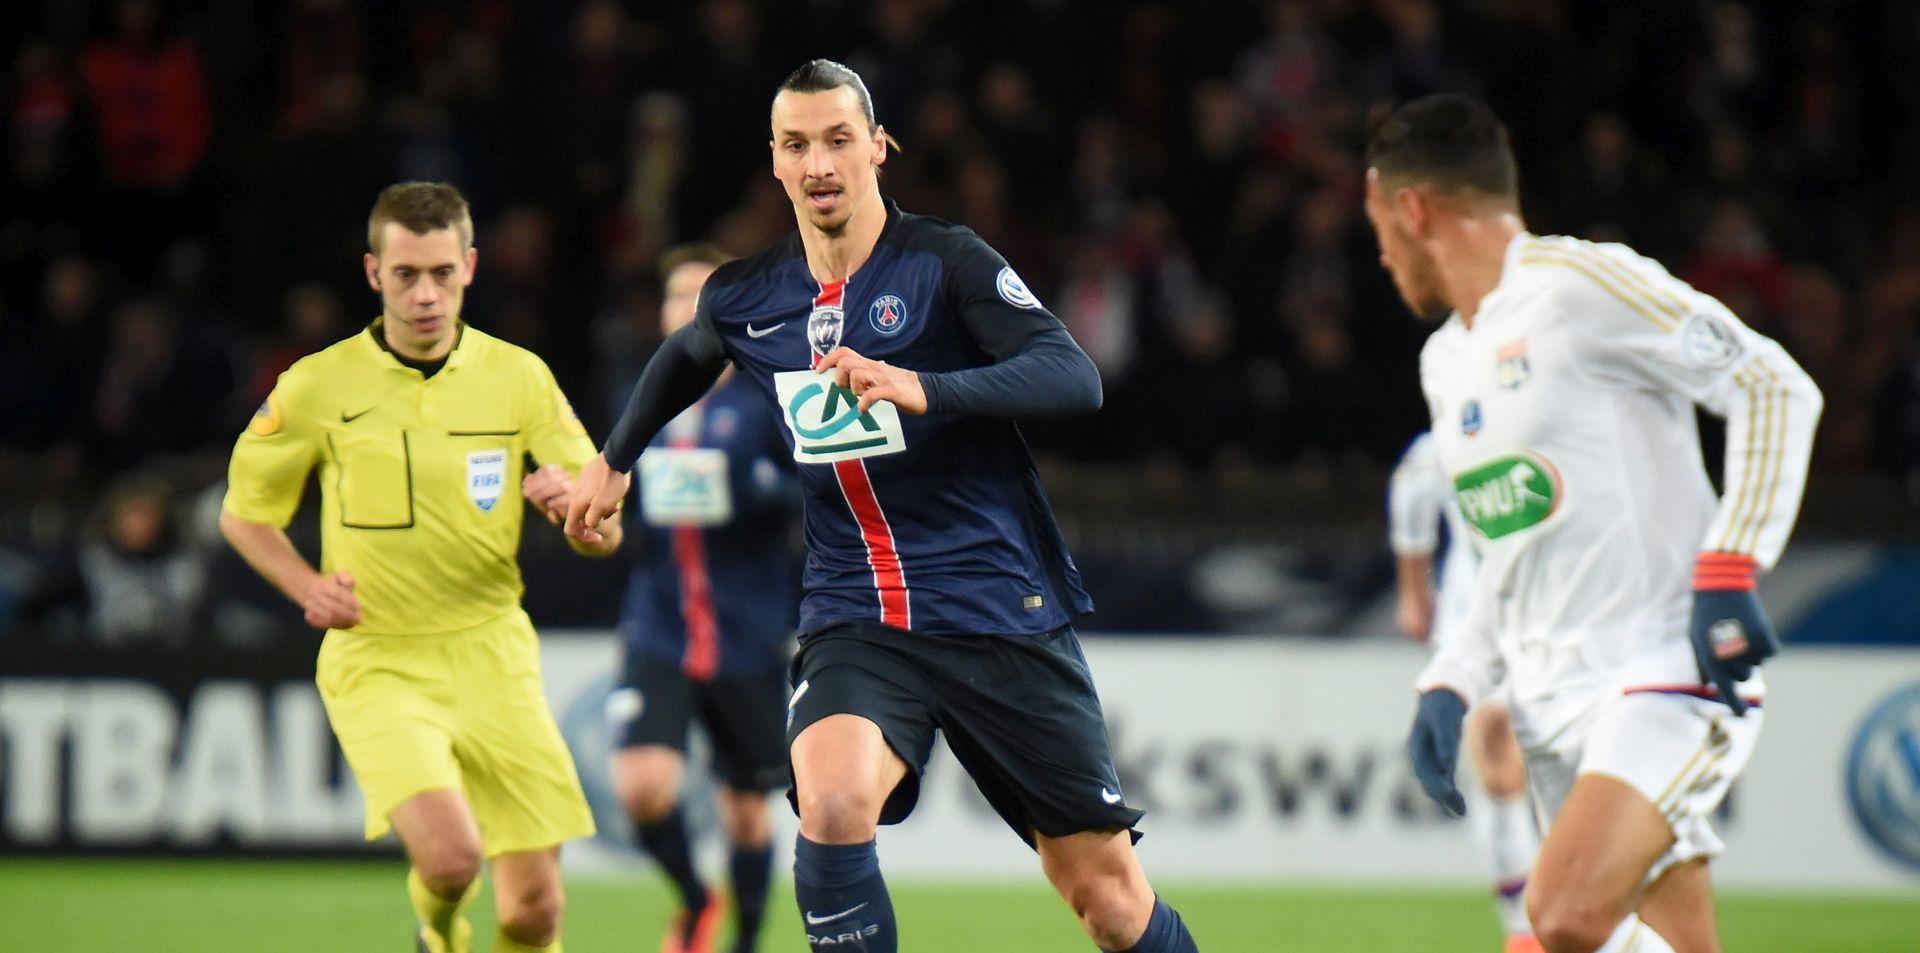 KAKAV BI TO SENZACIONALAN TRANSFER BIO West Ham želi dovesti Zlatana Ibrahimovića